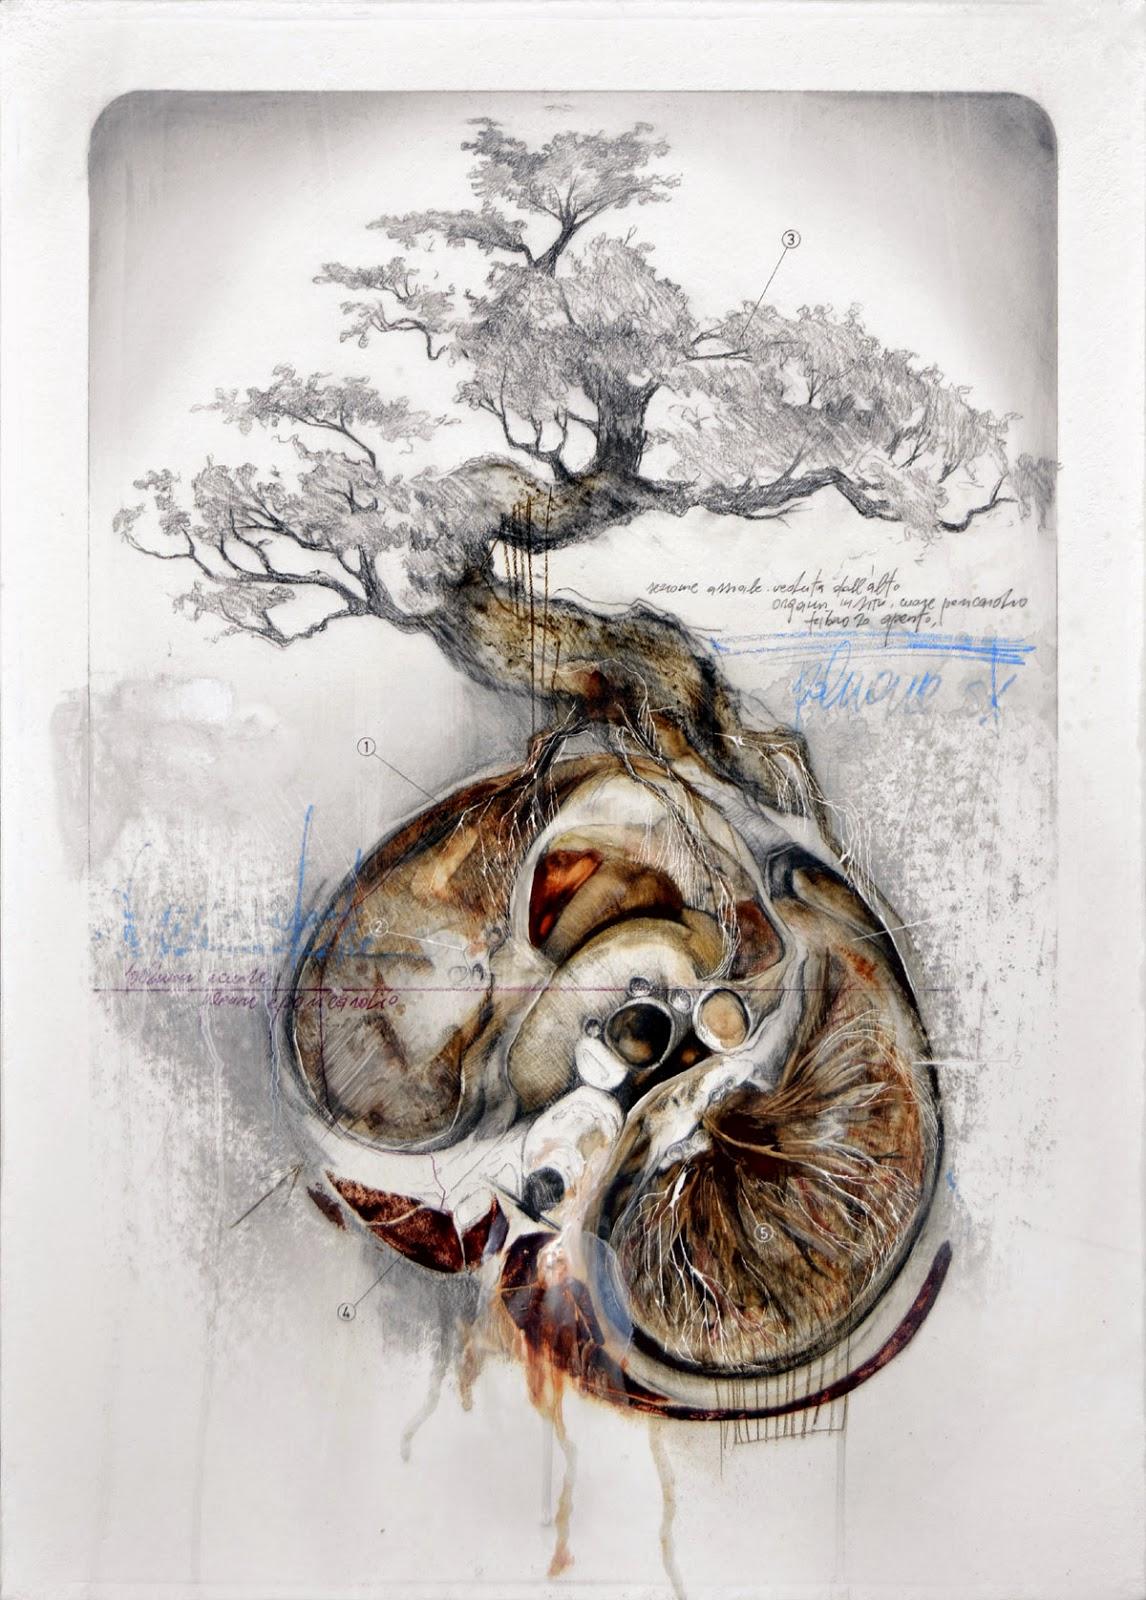 nunzio-paci-human-illustration 5